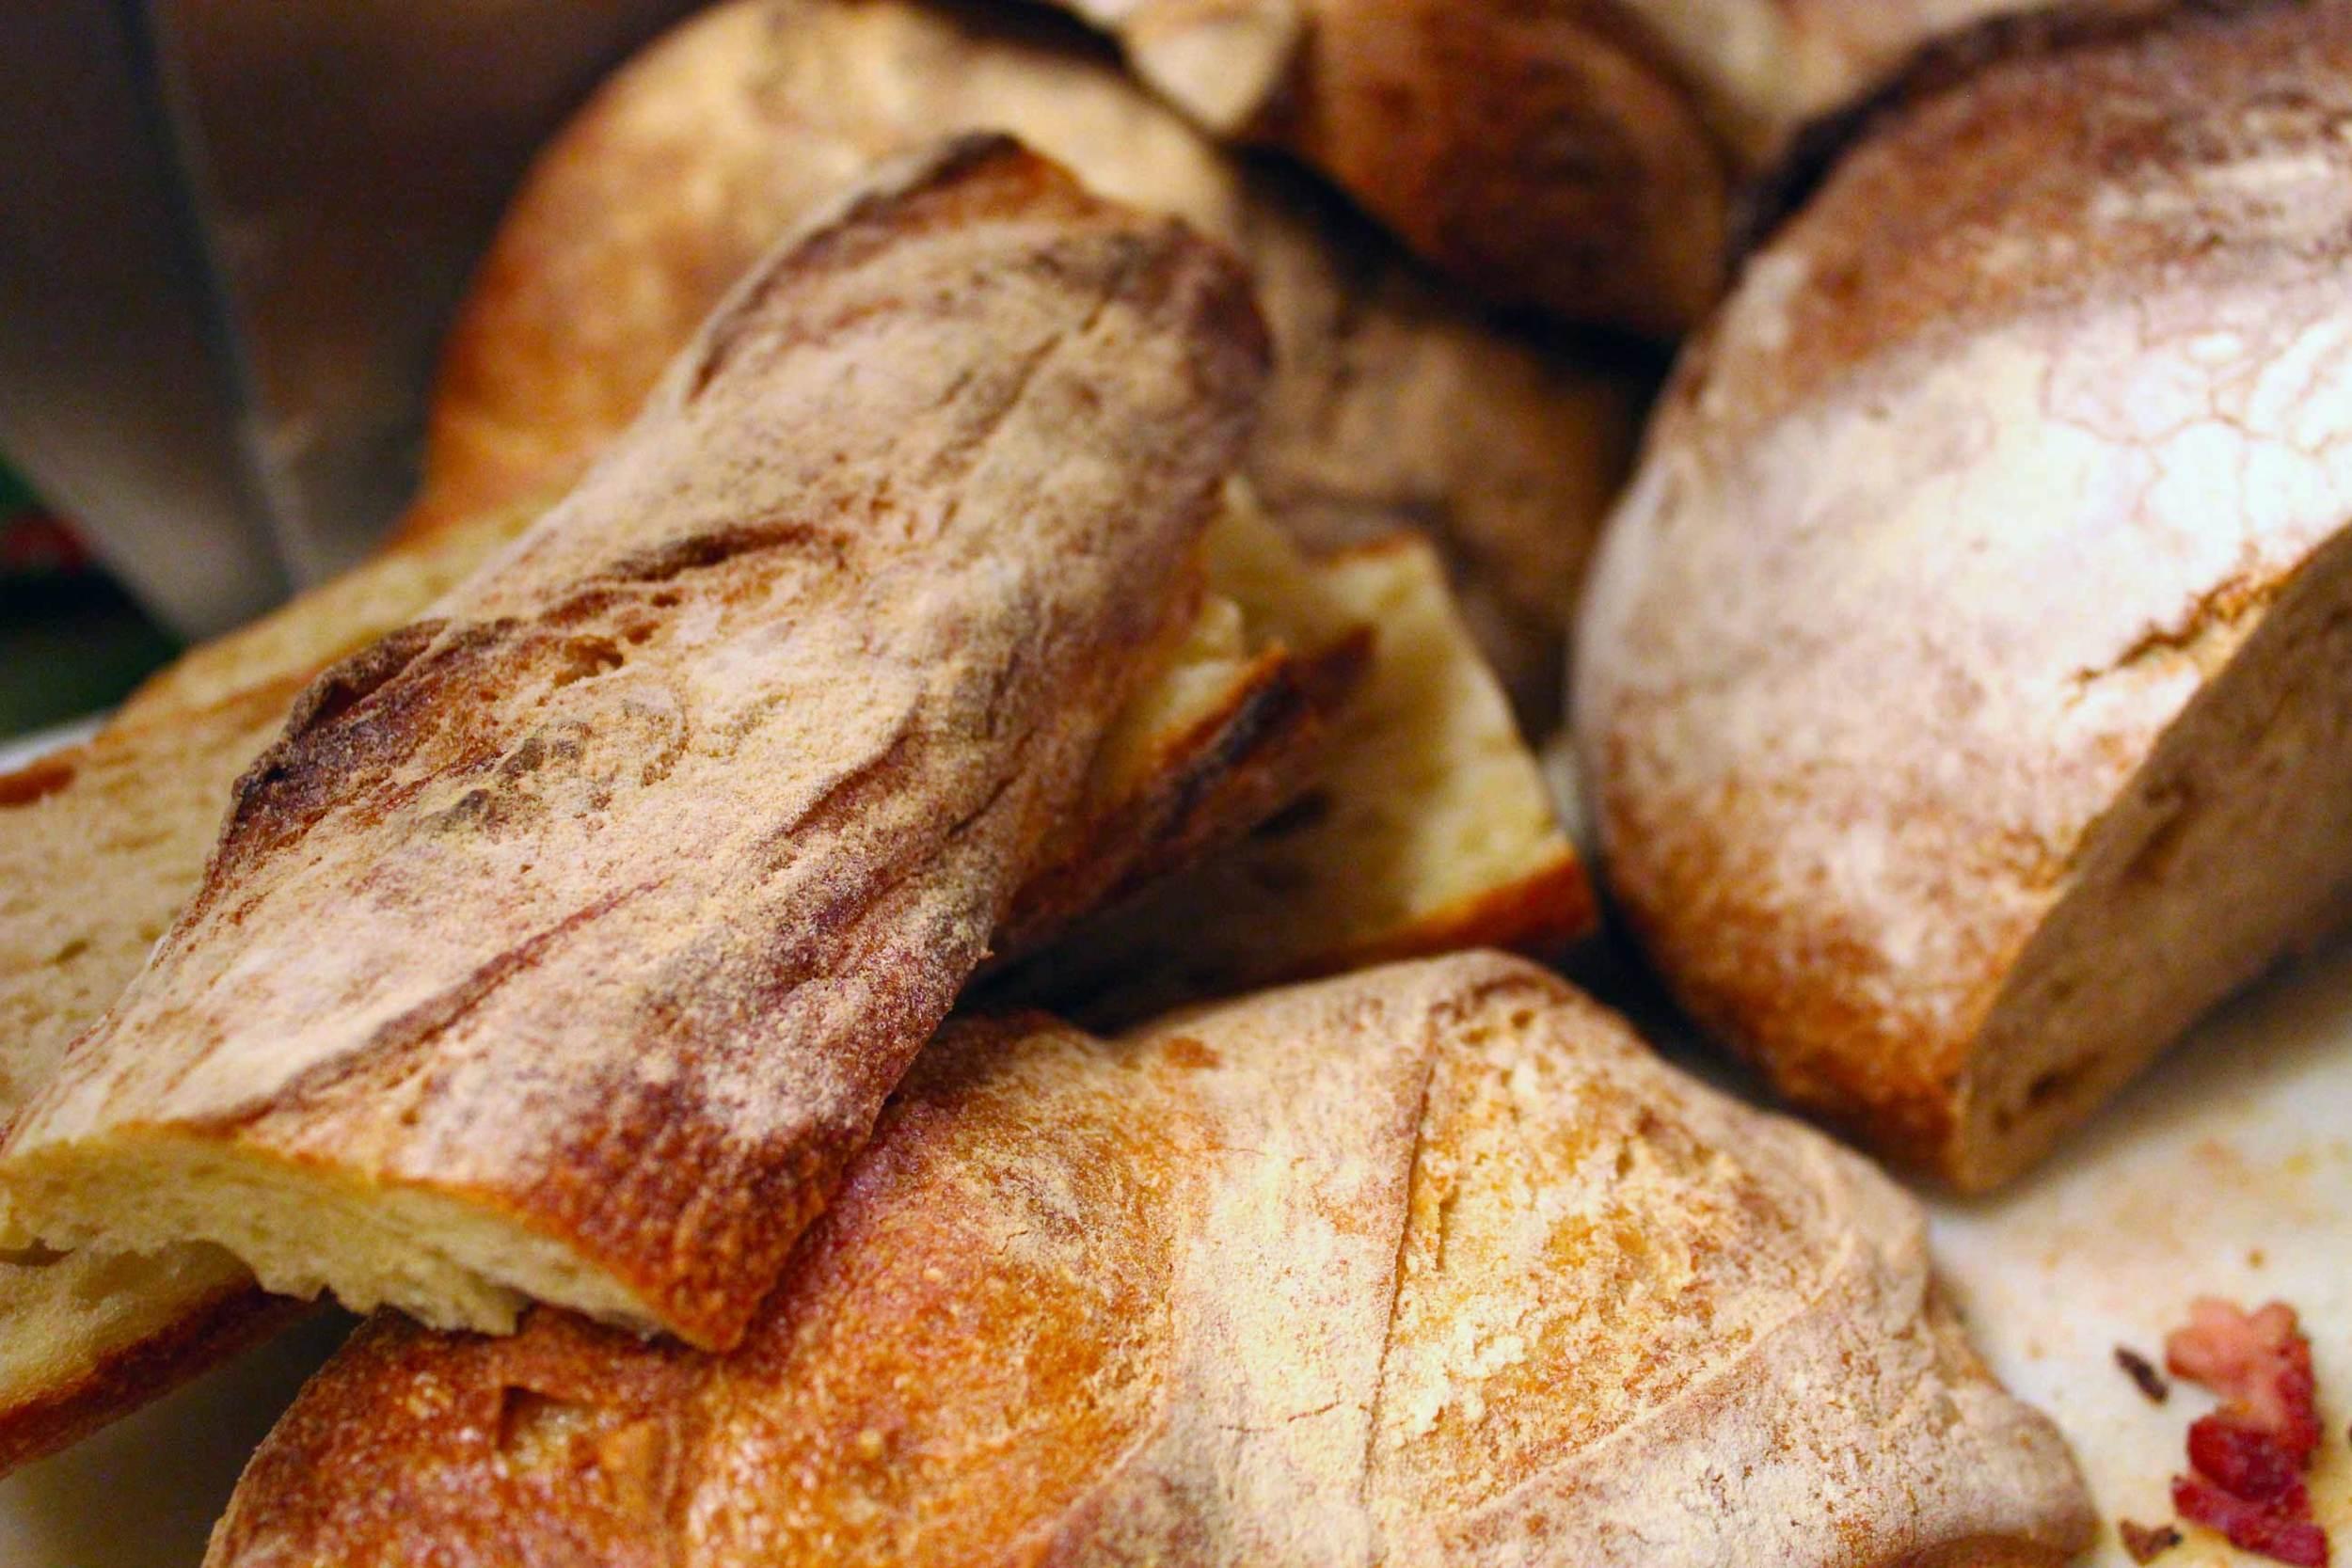 IMG_7089_Mtuccis_Fresh_Baked_Bread.jpg